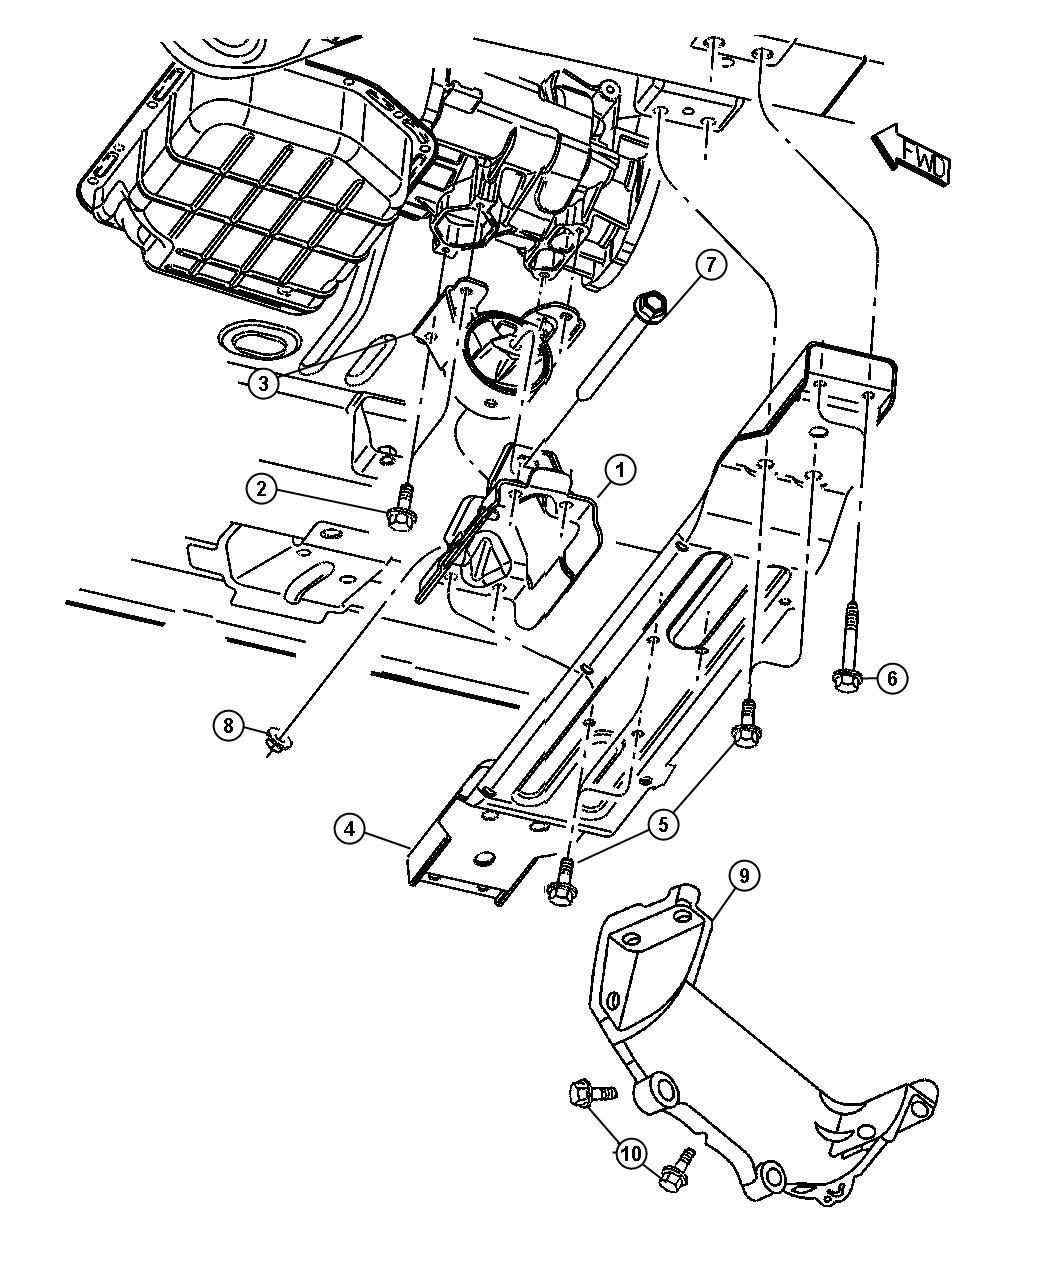 2001 Jeep Grand Cherokee Bolt. Evaevc, mountingrear